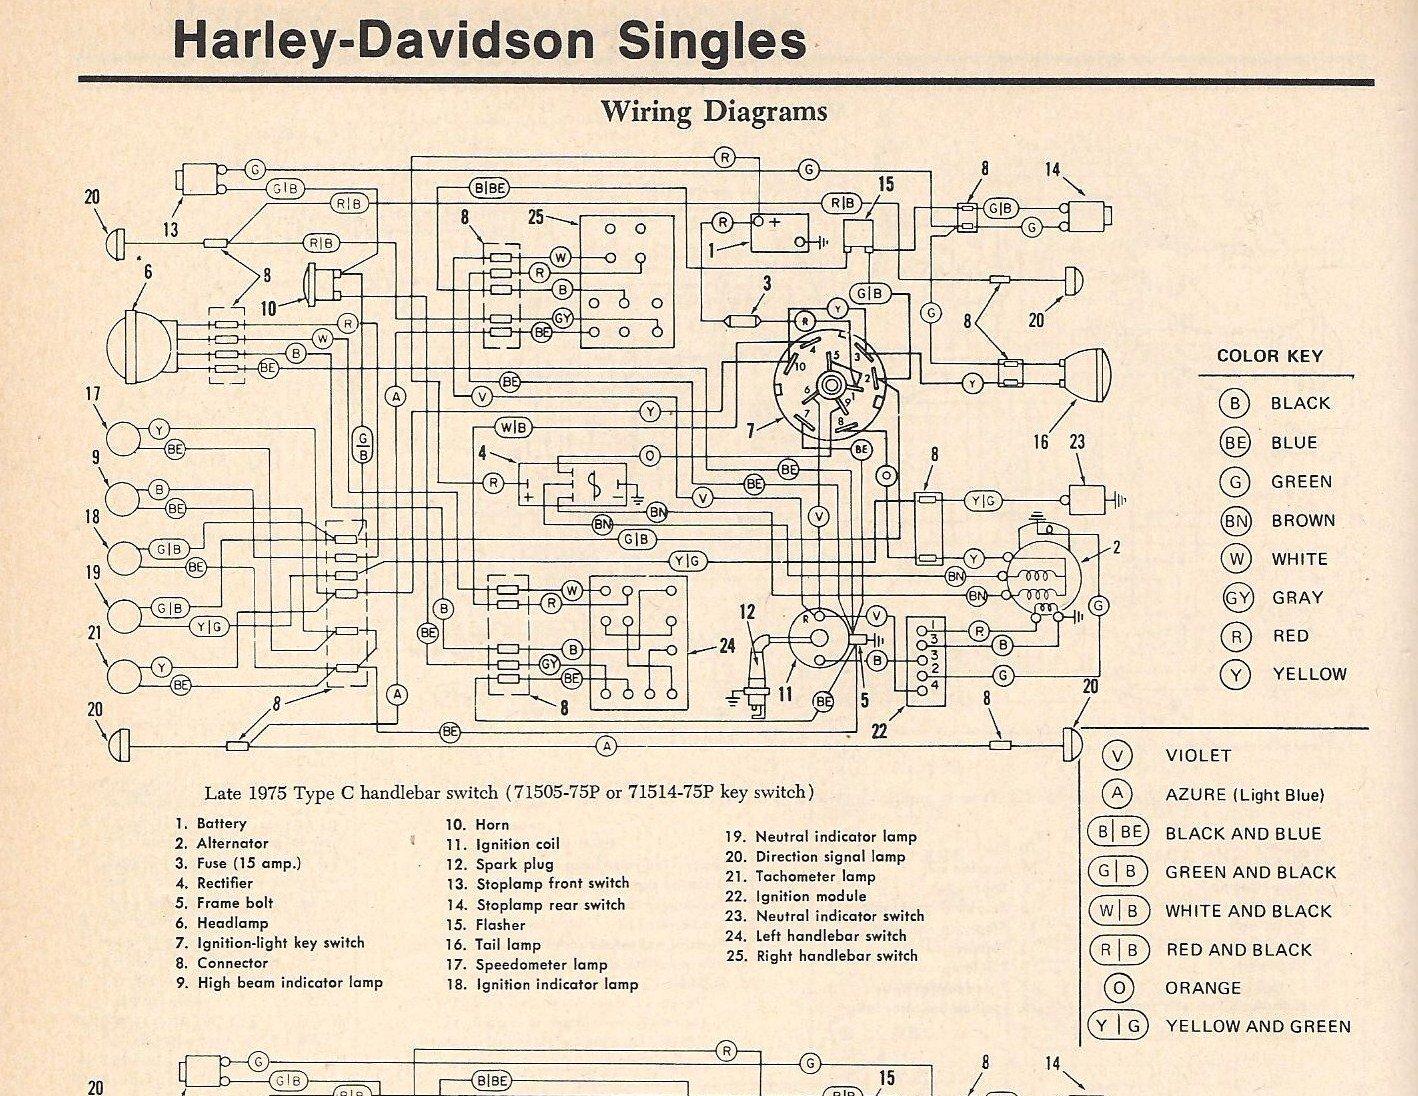 1967 Aermacchi Wiring Diagram - Diy Home Network Wiring Diagram for Wiring  Diagram Schematics | Aermacchi X90 Wiring Diagram For |  | Leggenda Urbana